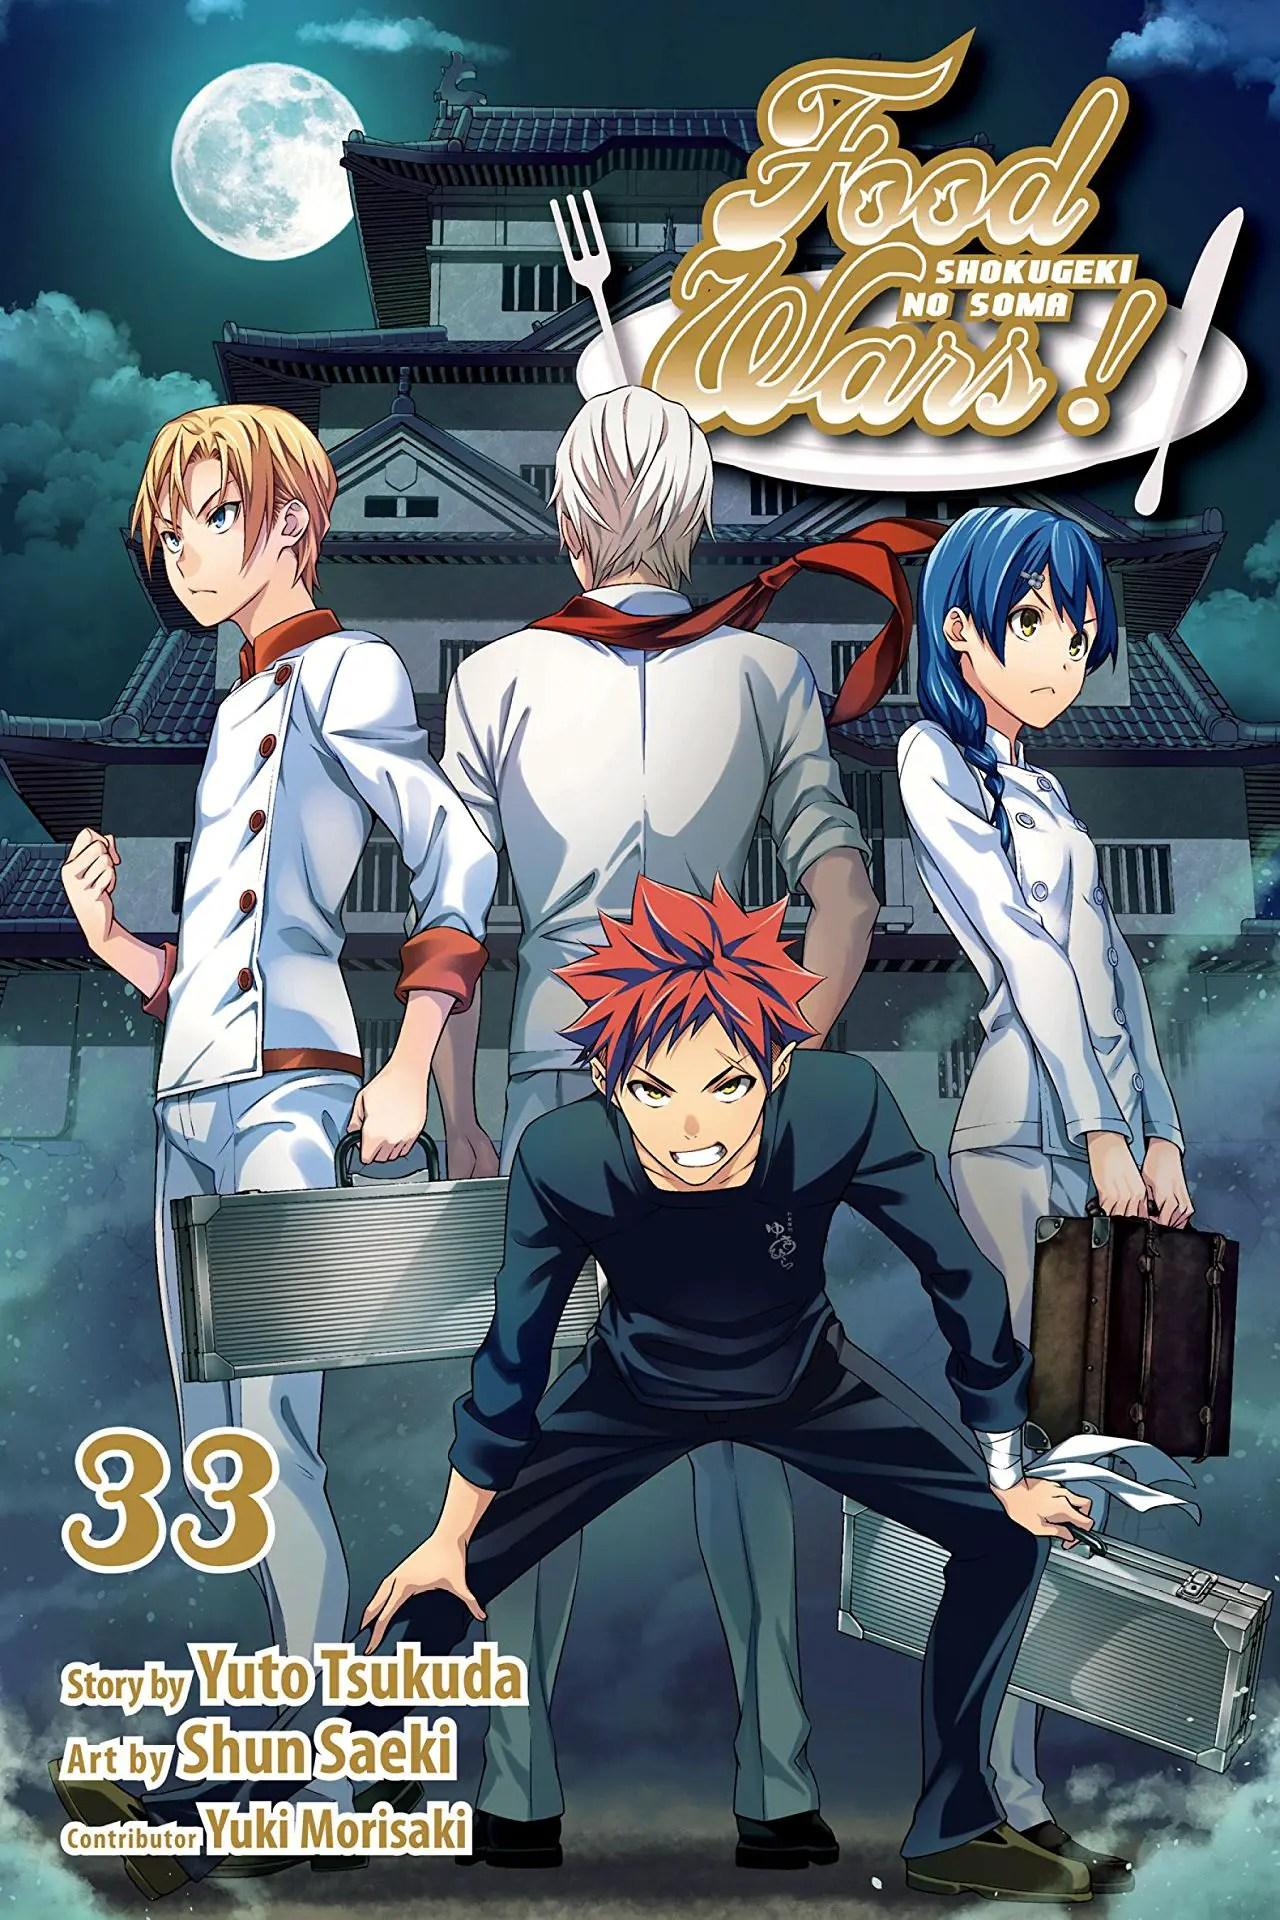 Food Wars!: Shokugeki no Soma, Vol. 33 Review